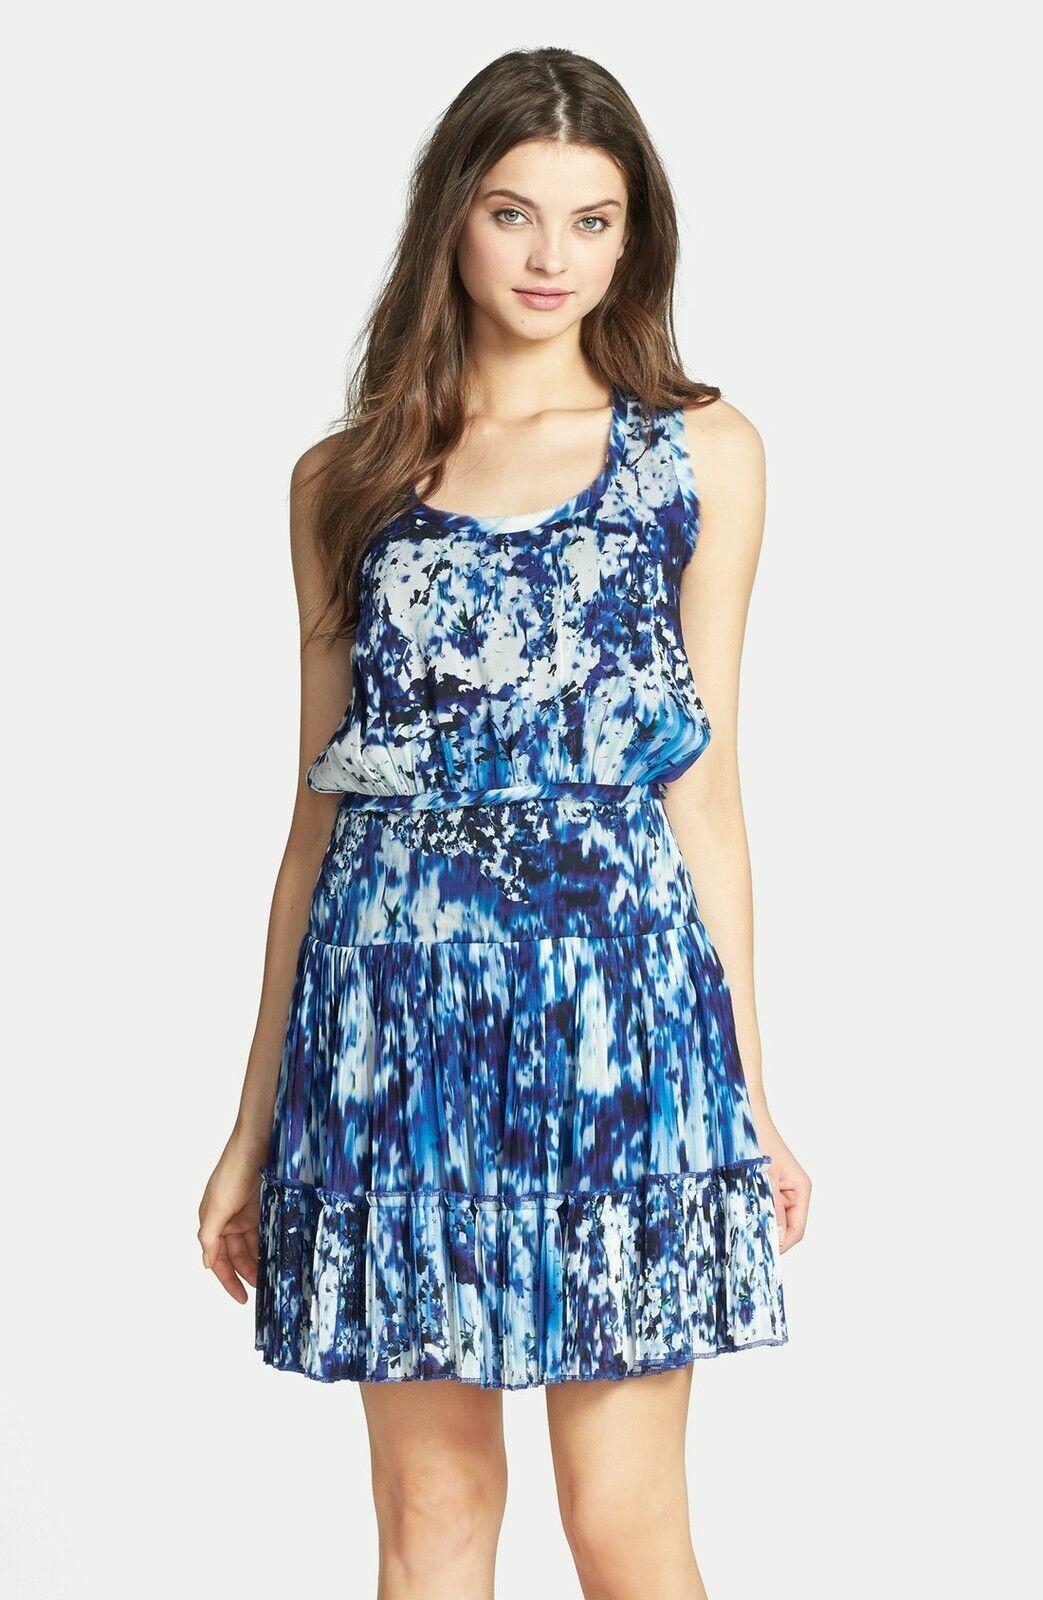 NWT Nicole Miller Artelier Mason in Lagoon Blau Pleated Hem Blouson Dress S M L